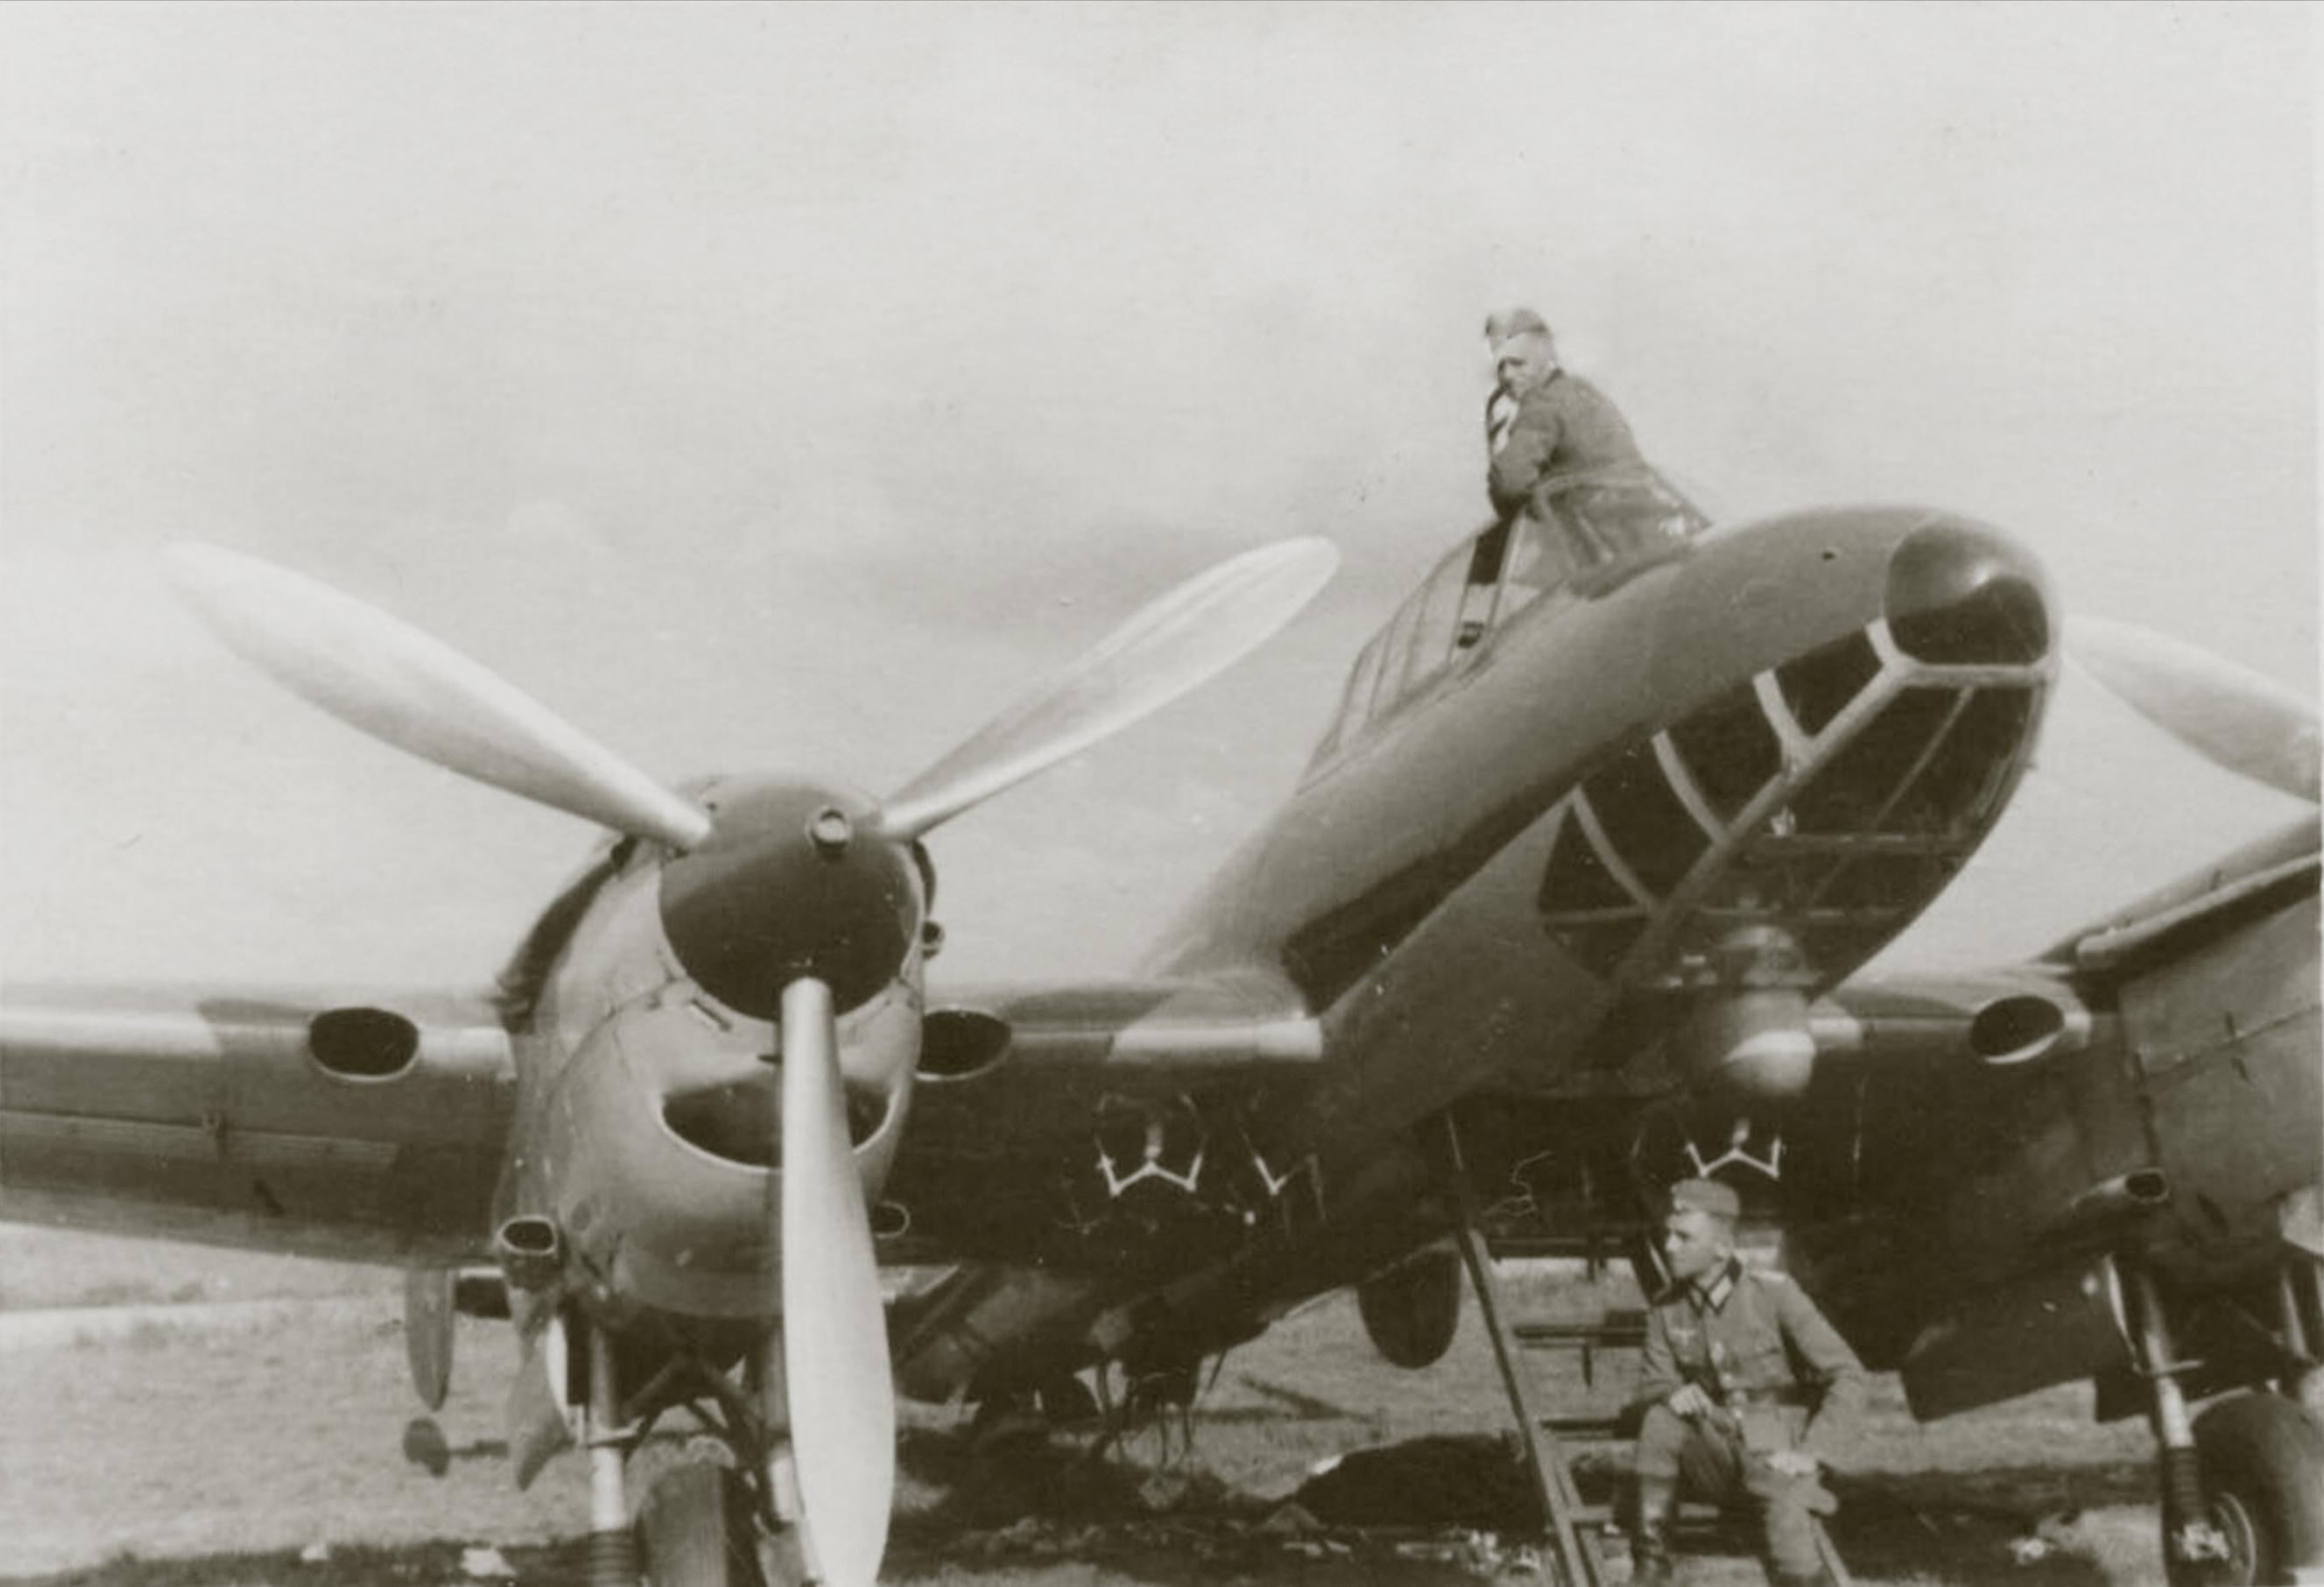 Petlyakov Pe 2 captured intact during Operation Barbarossa 1941 ebay 01